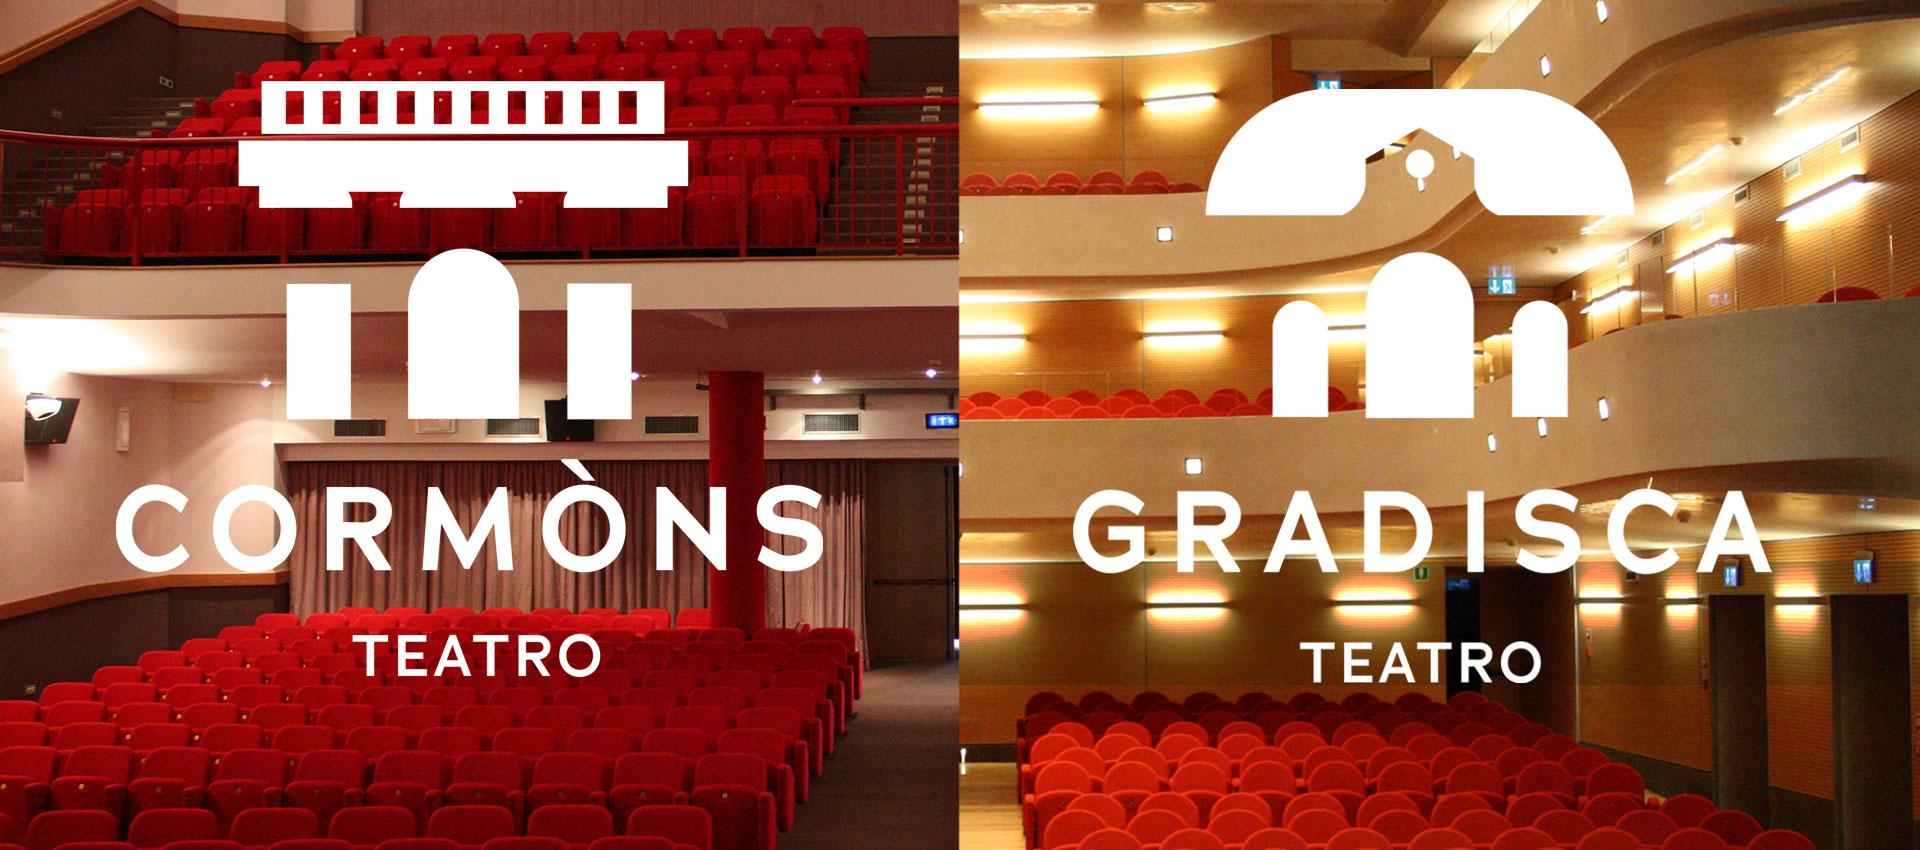 1920x850-interno-2-teatri